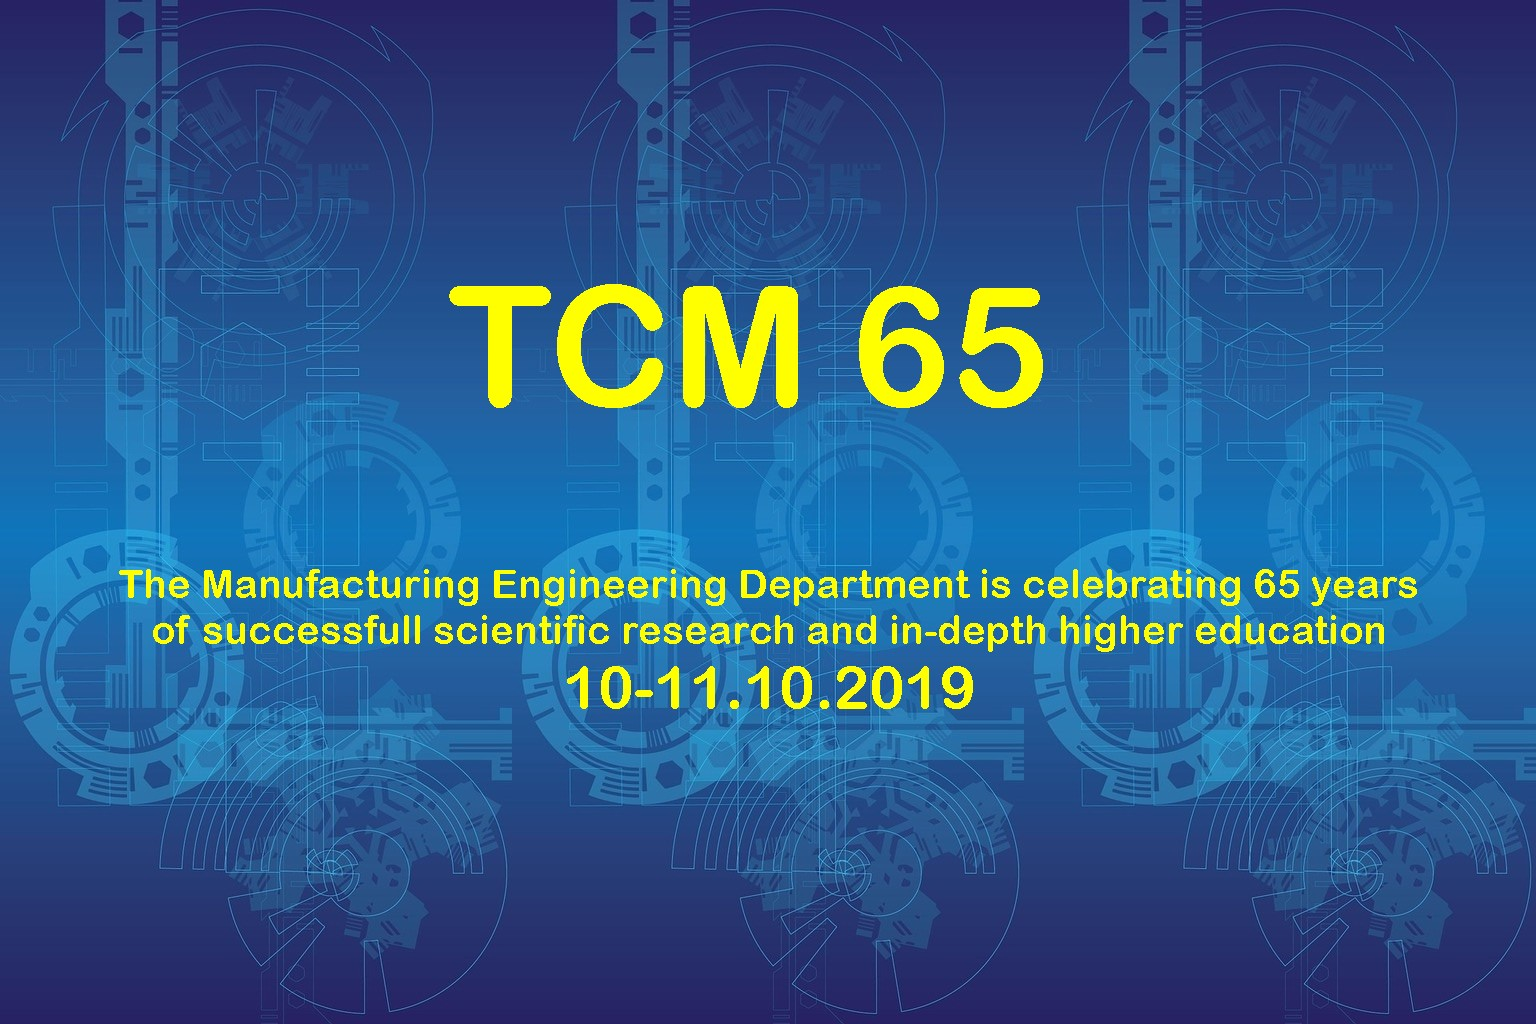 TCM 65 upb